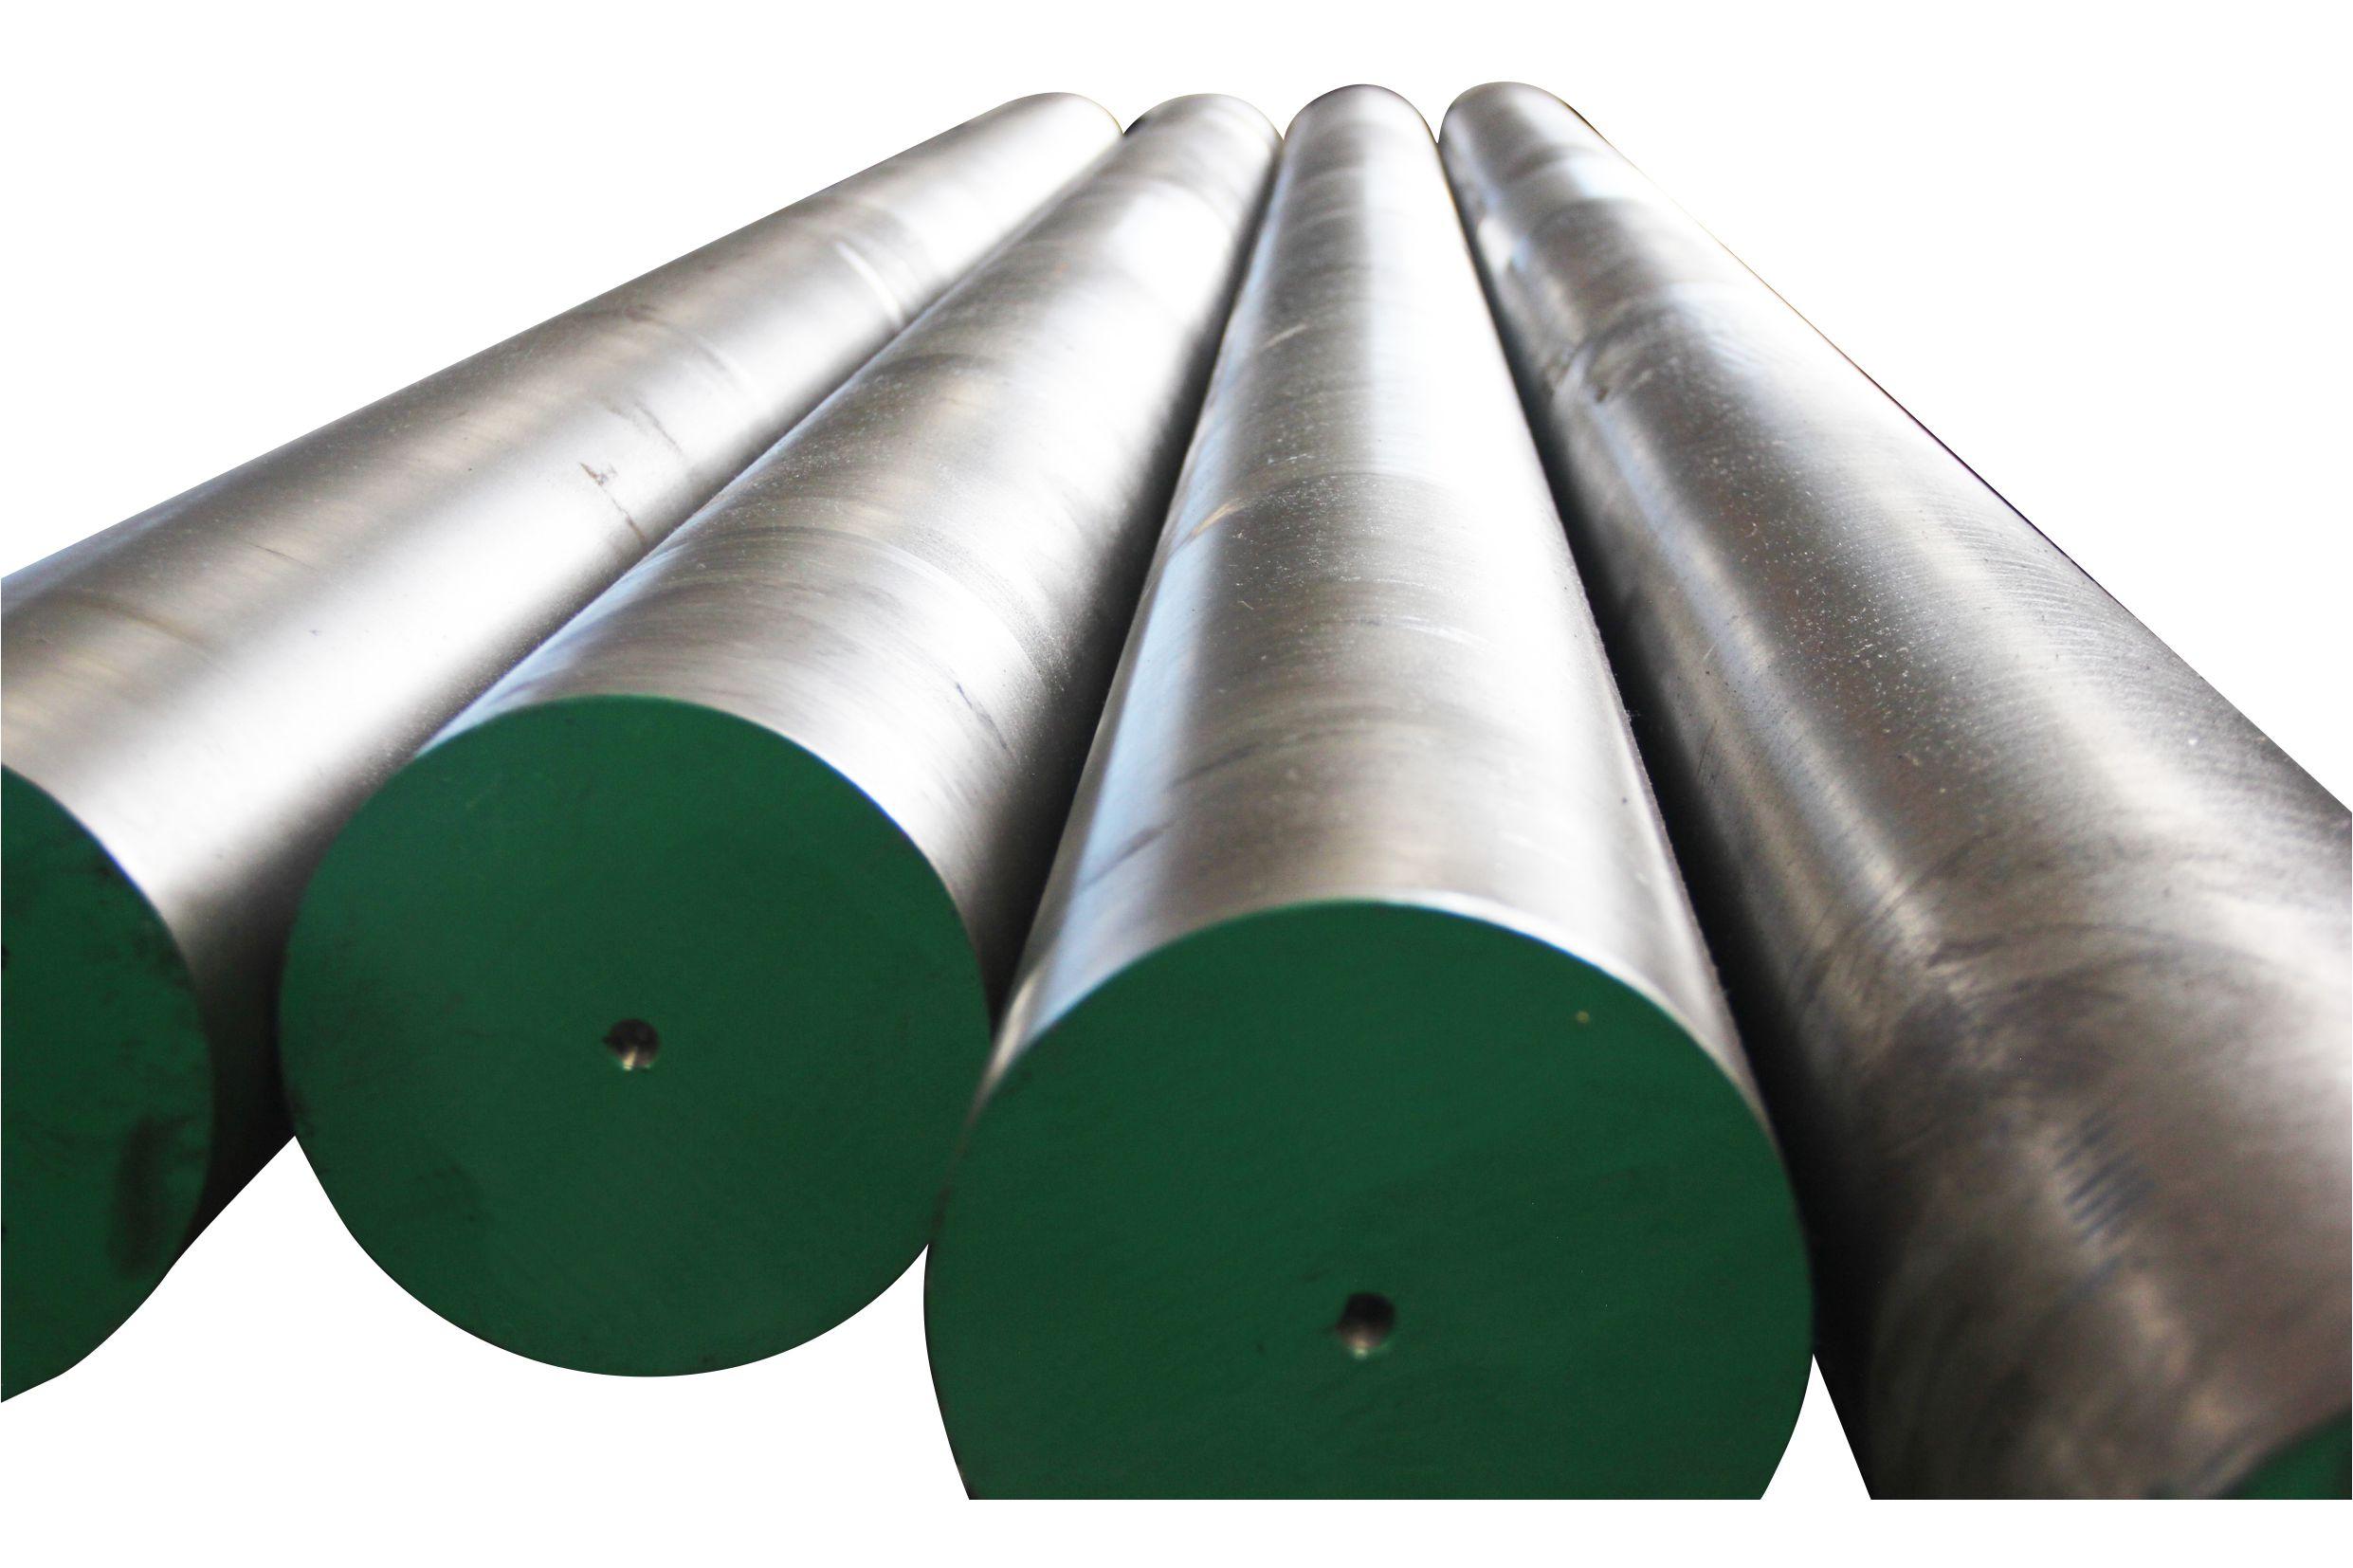 d2 tool steel rounds